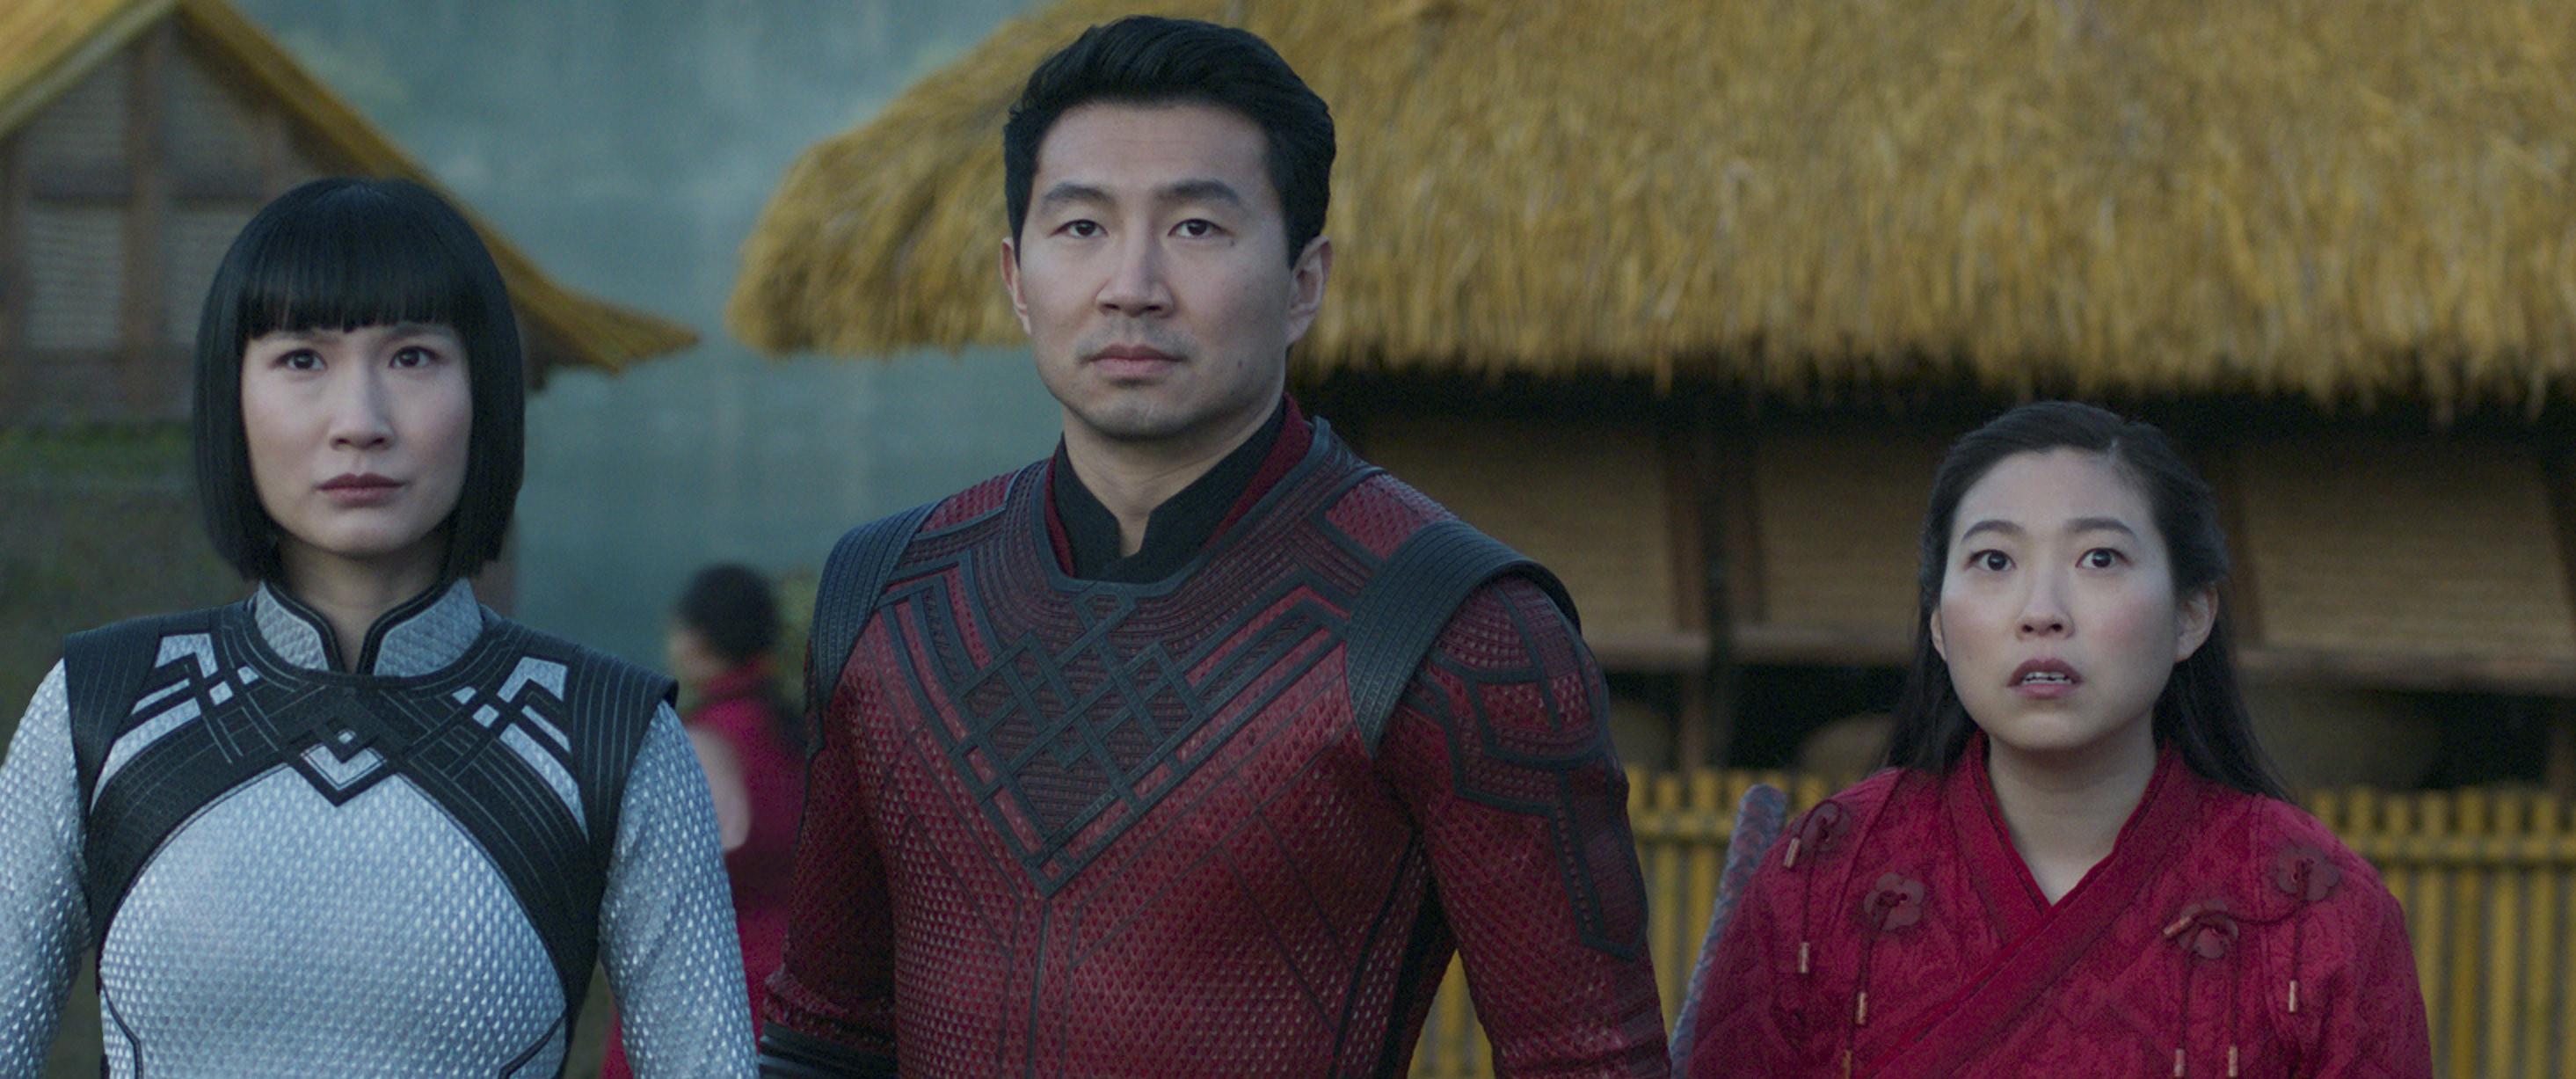 Meng'er, Simu, and Awkwafina in Shang Chi